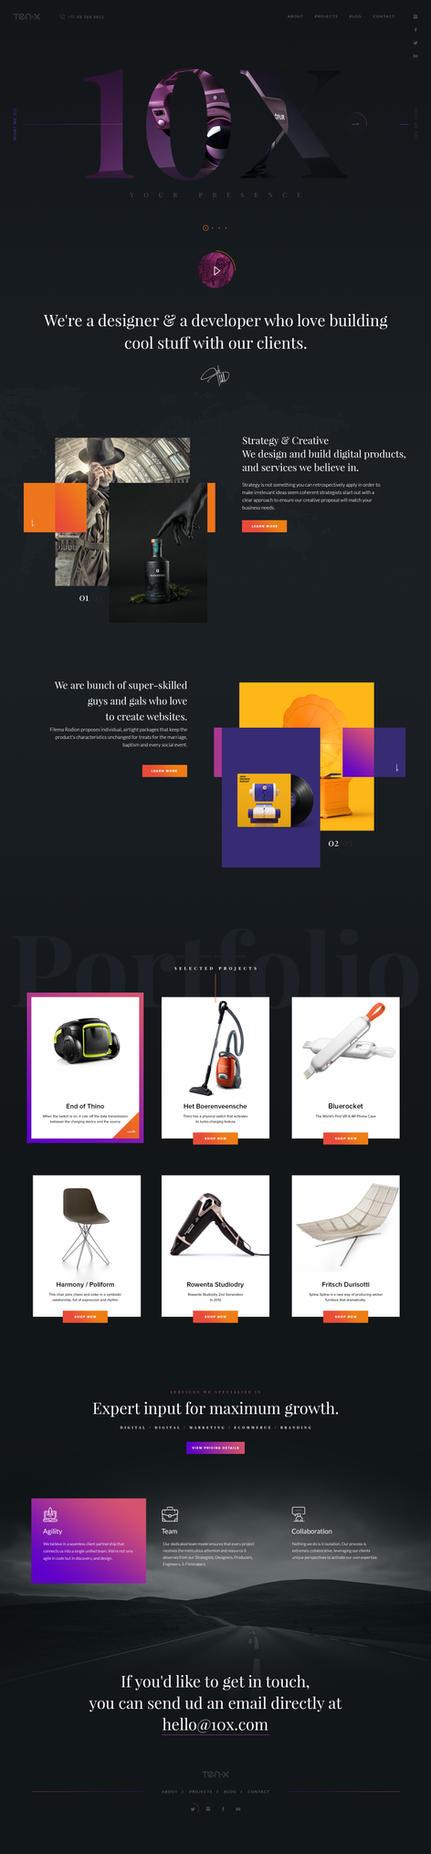 10X - Free PSD by pixelzeesh